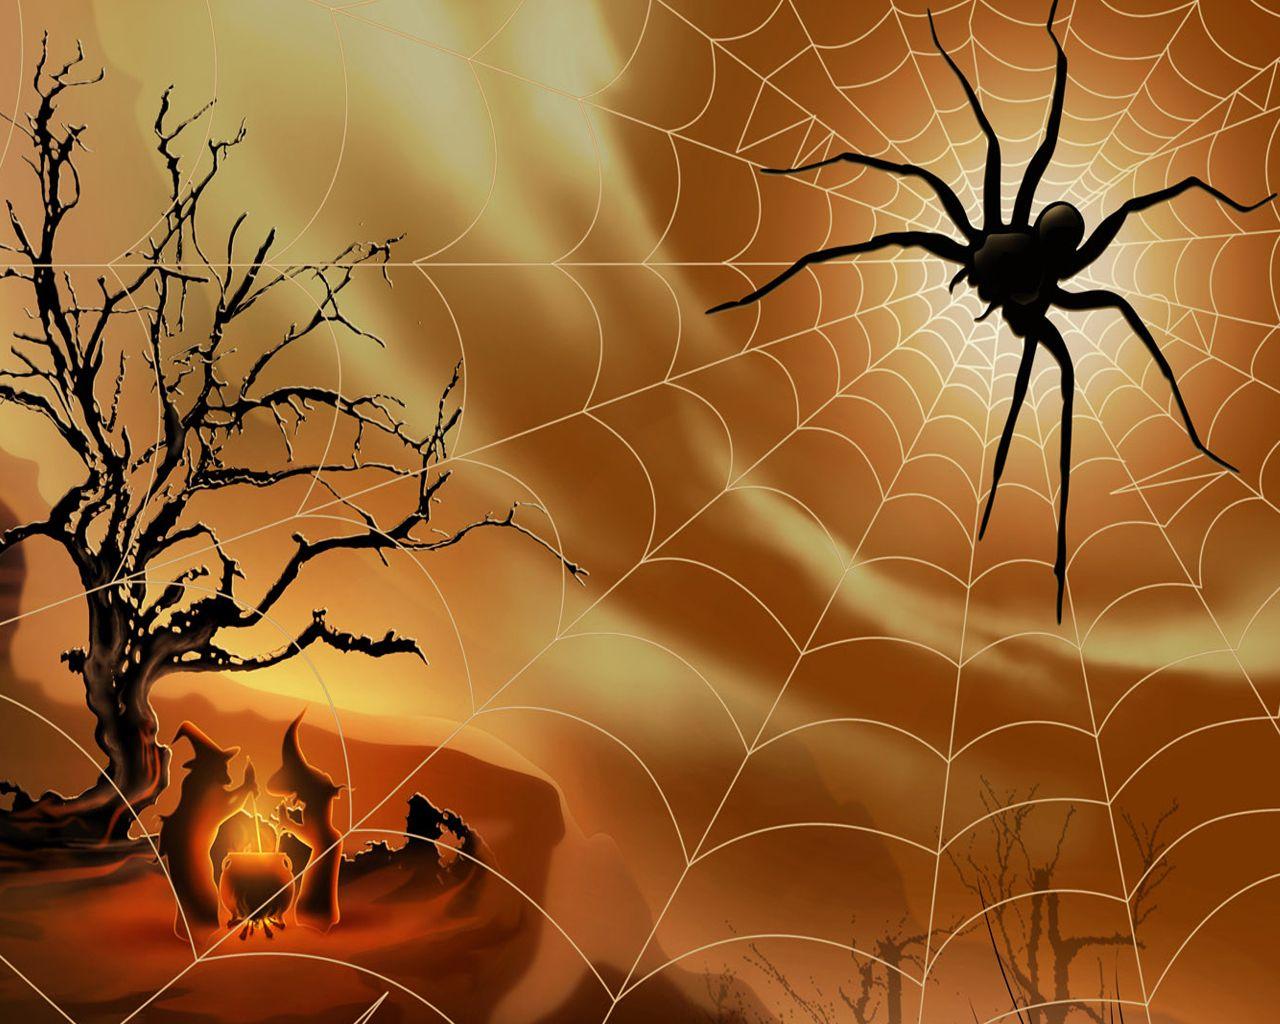 Beautiful Wallpaper Halloween Spider - 06b6ce10a130616279e6a9e733343f7e  Graphic_355594.jpg